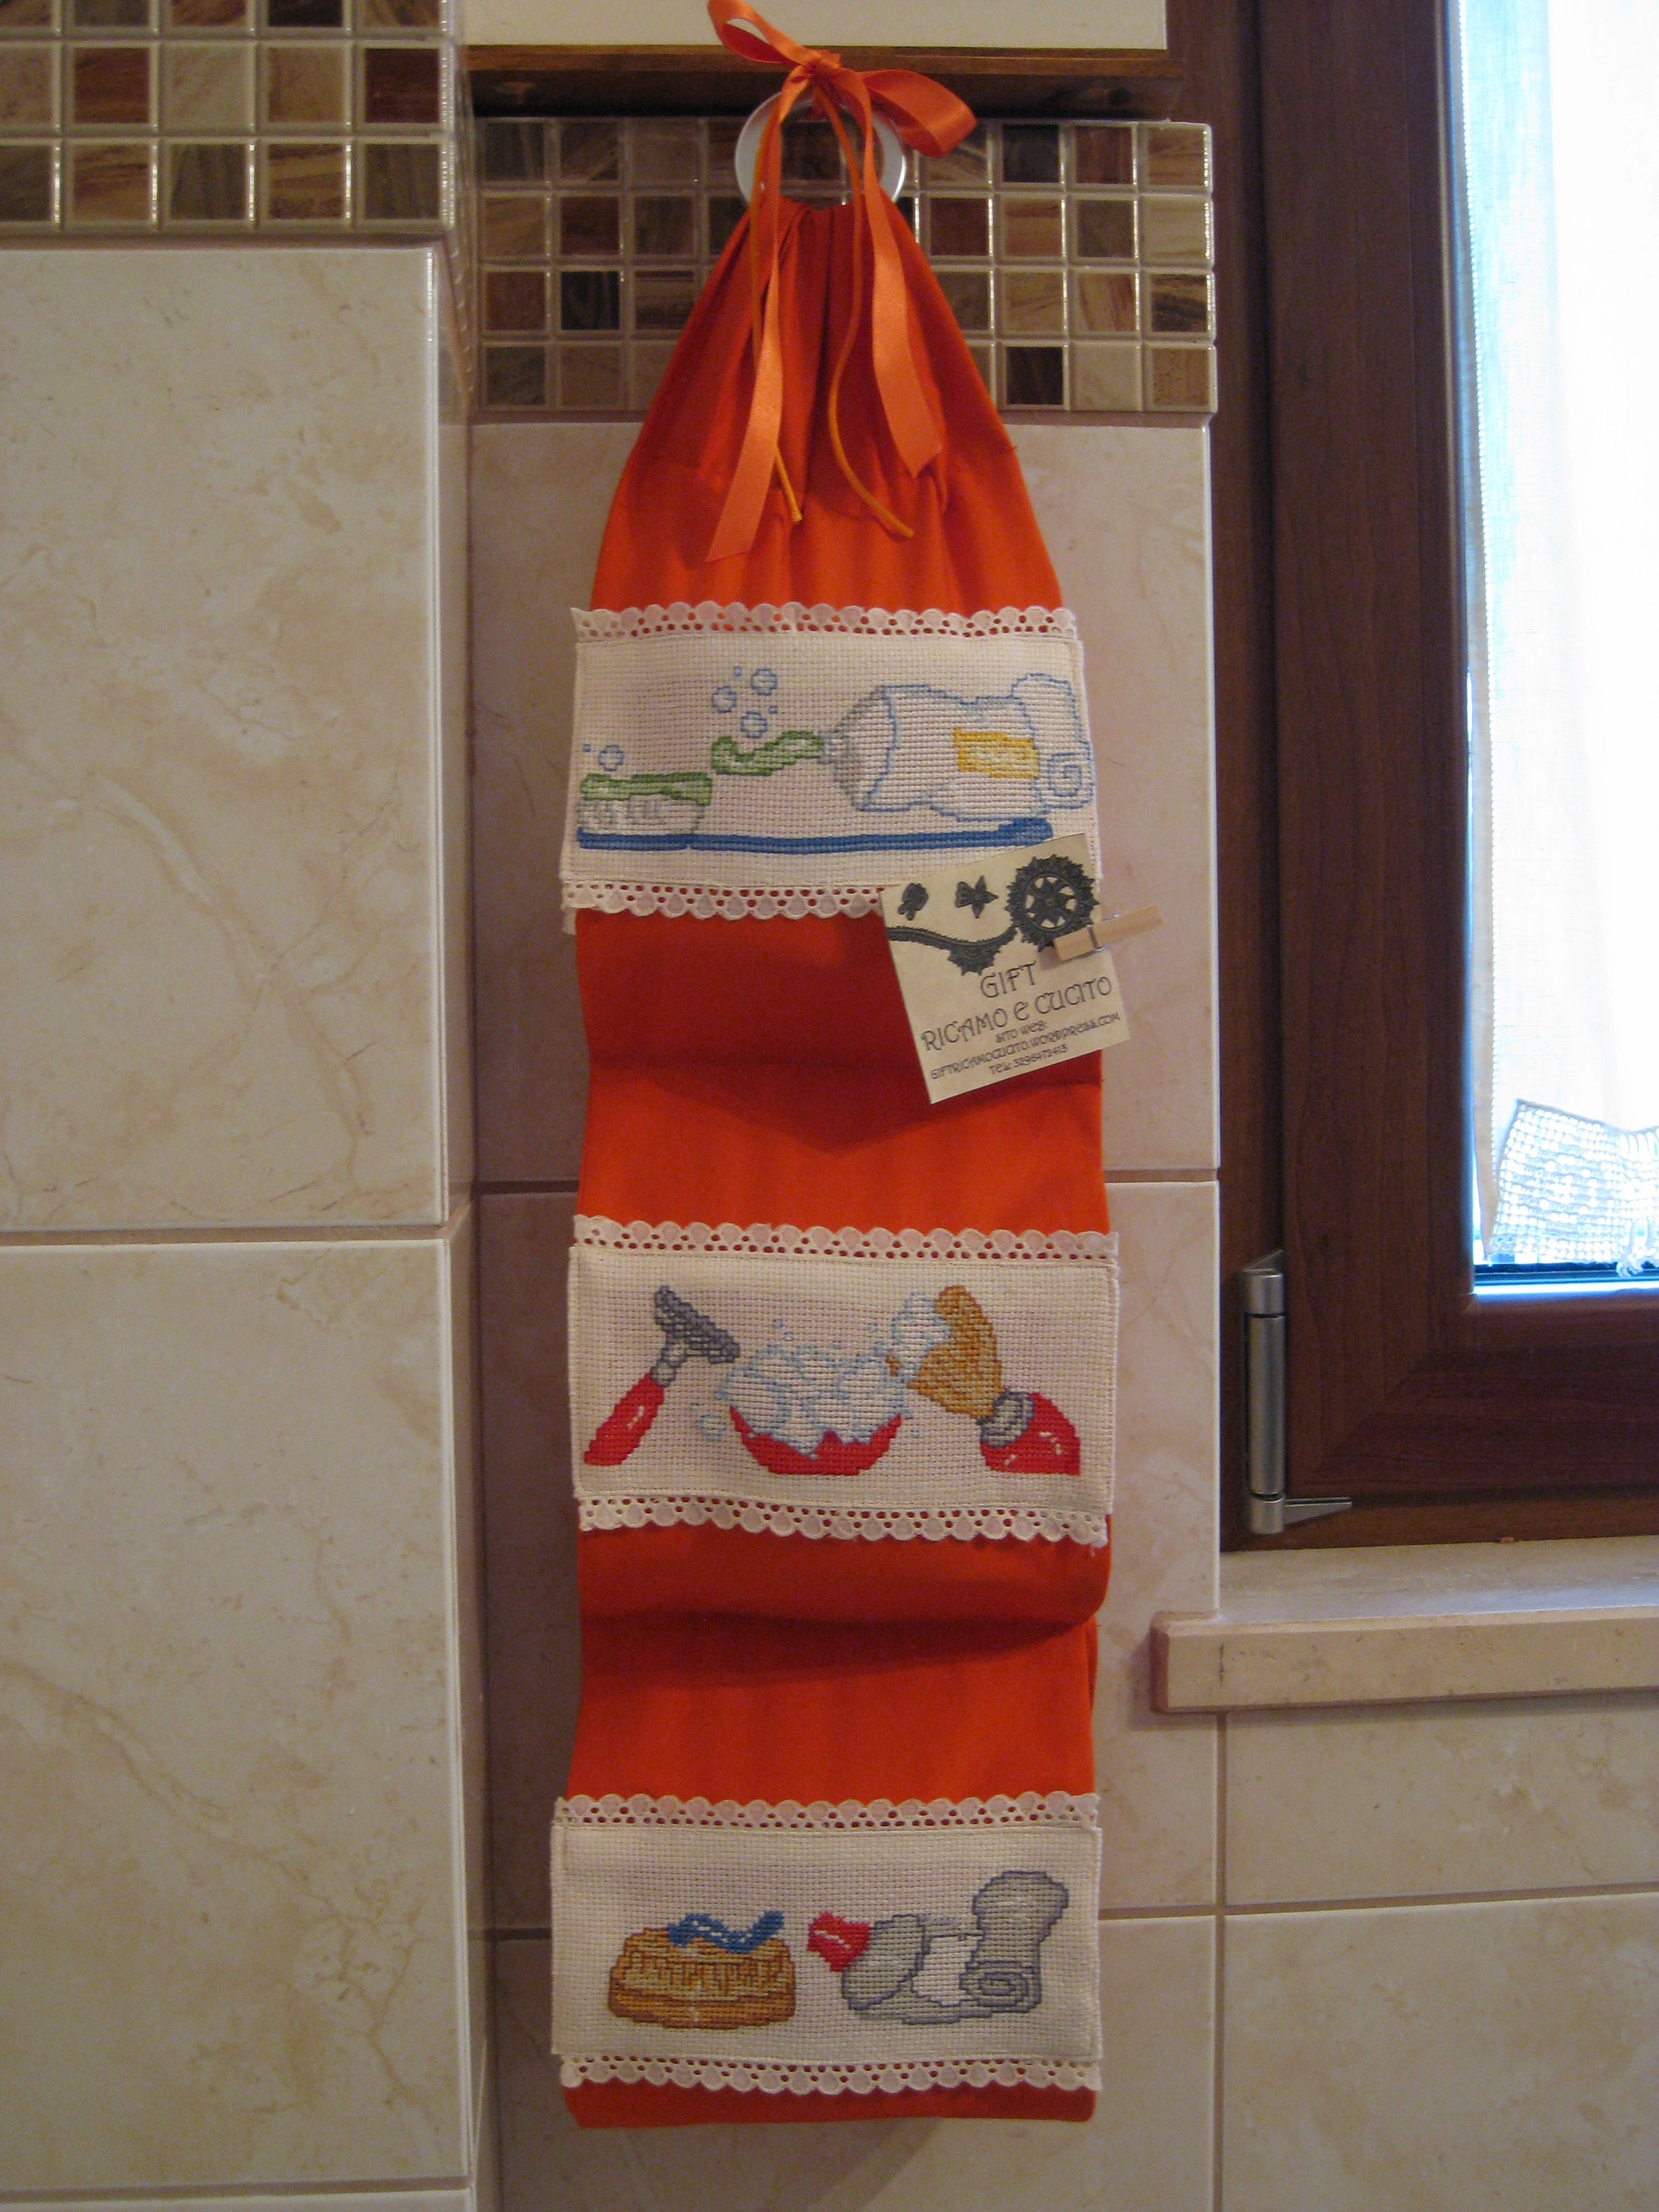 Porta carta igenica gift - Porta carta igienica ...